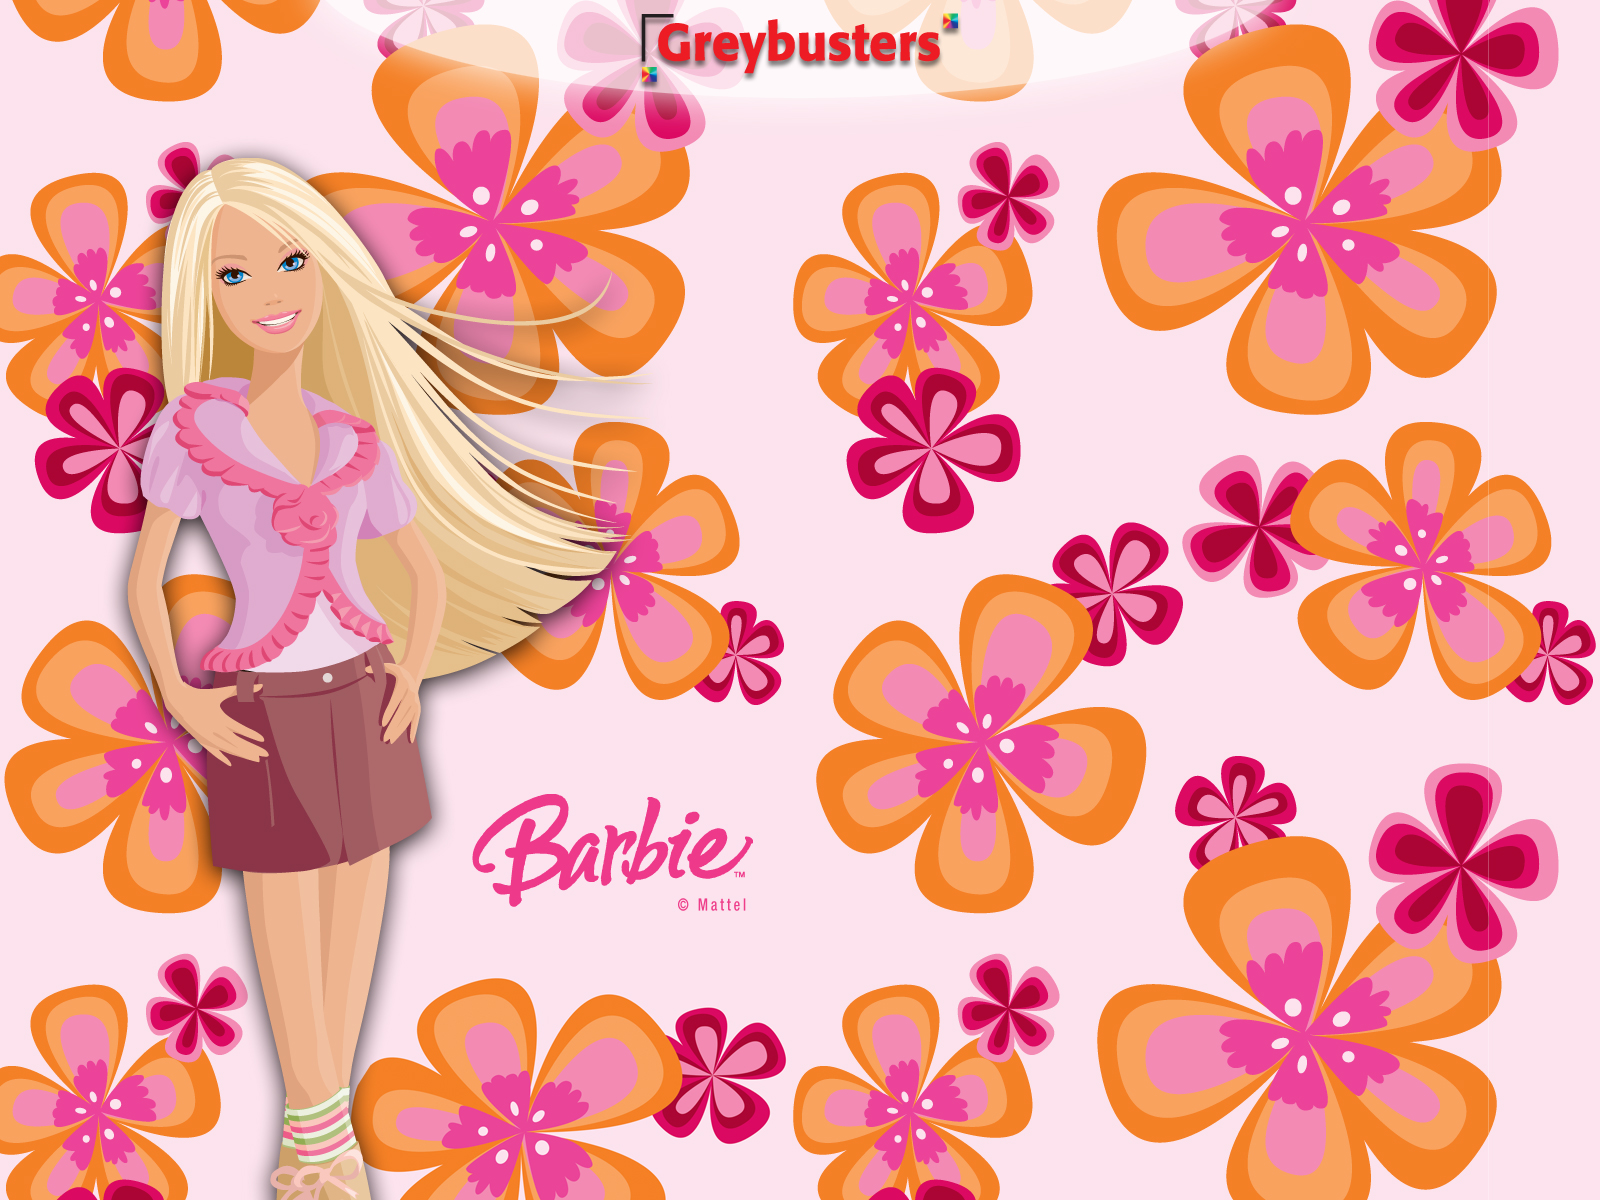 50 Barbie Wallpaper For Computer On Wallpapersafari